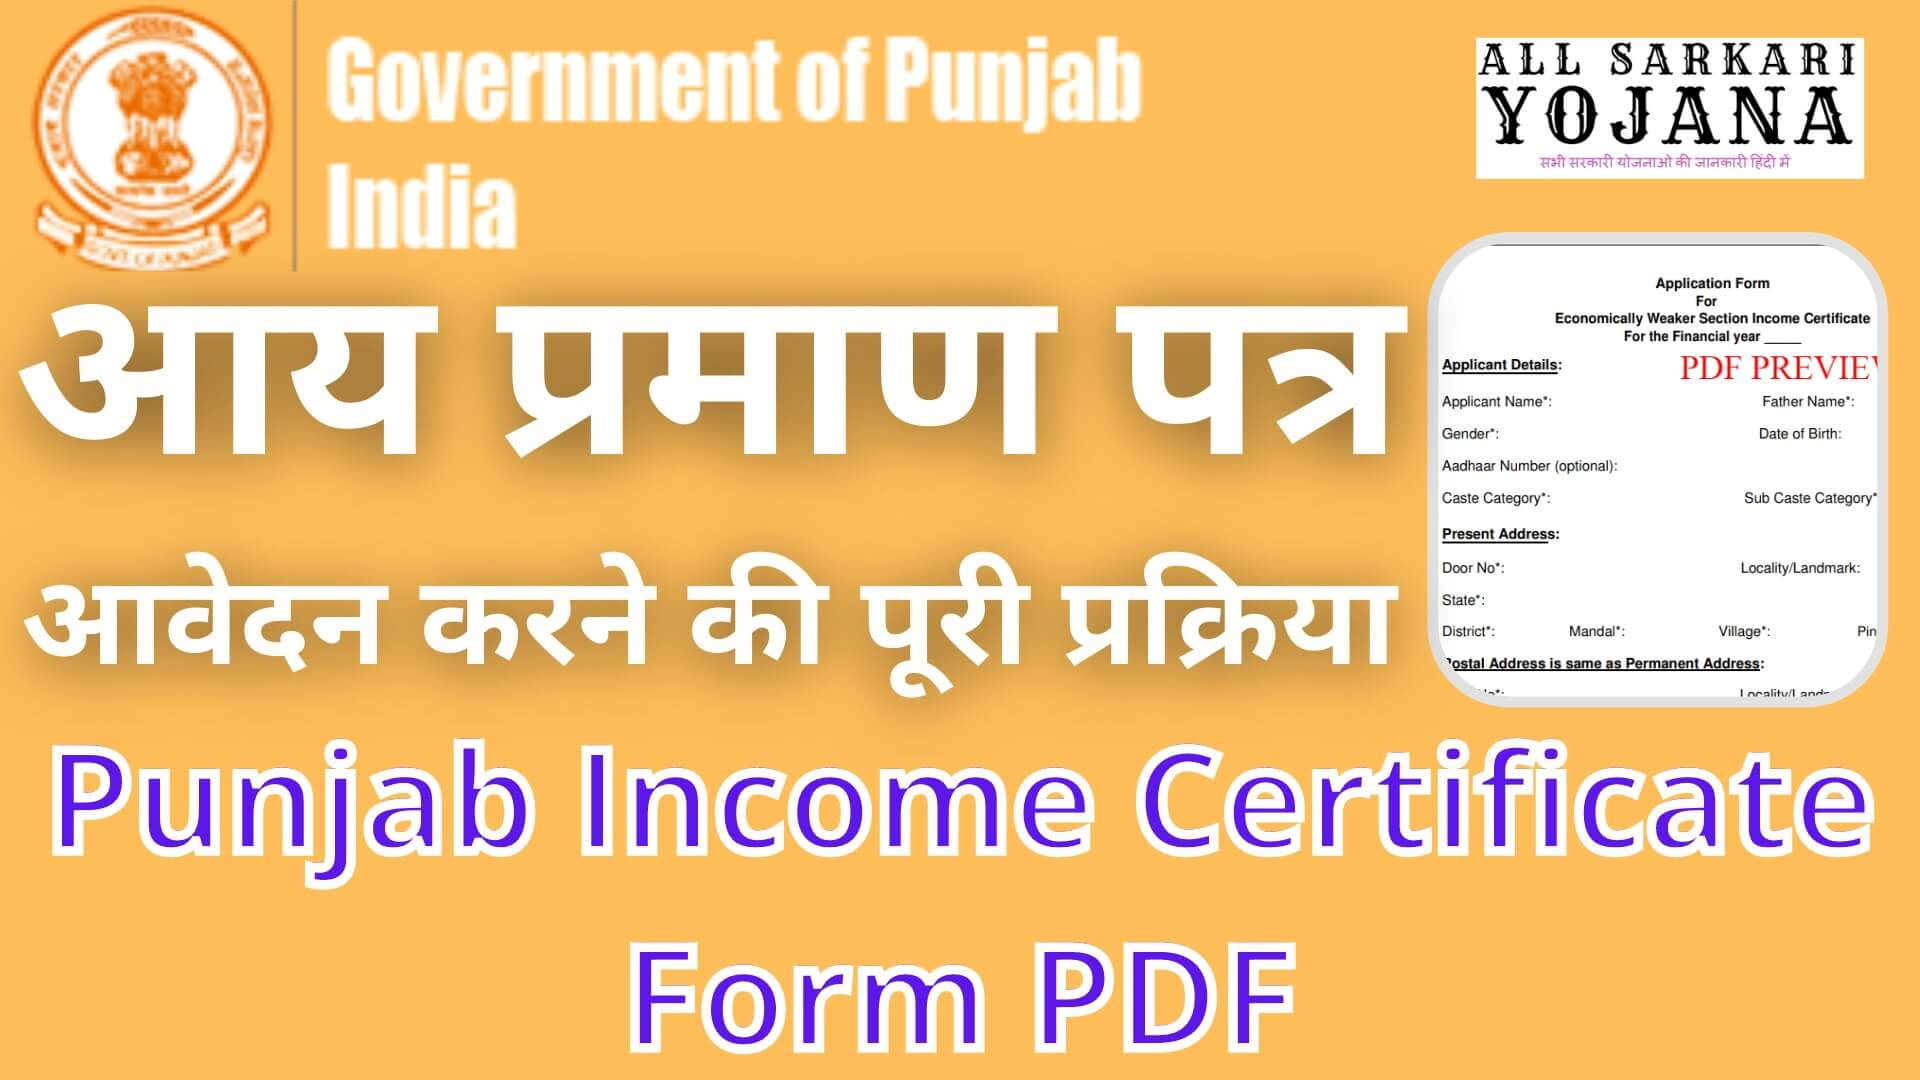 Punjab Income Certificate